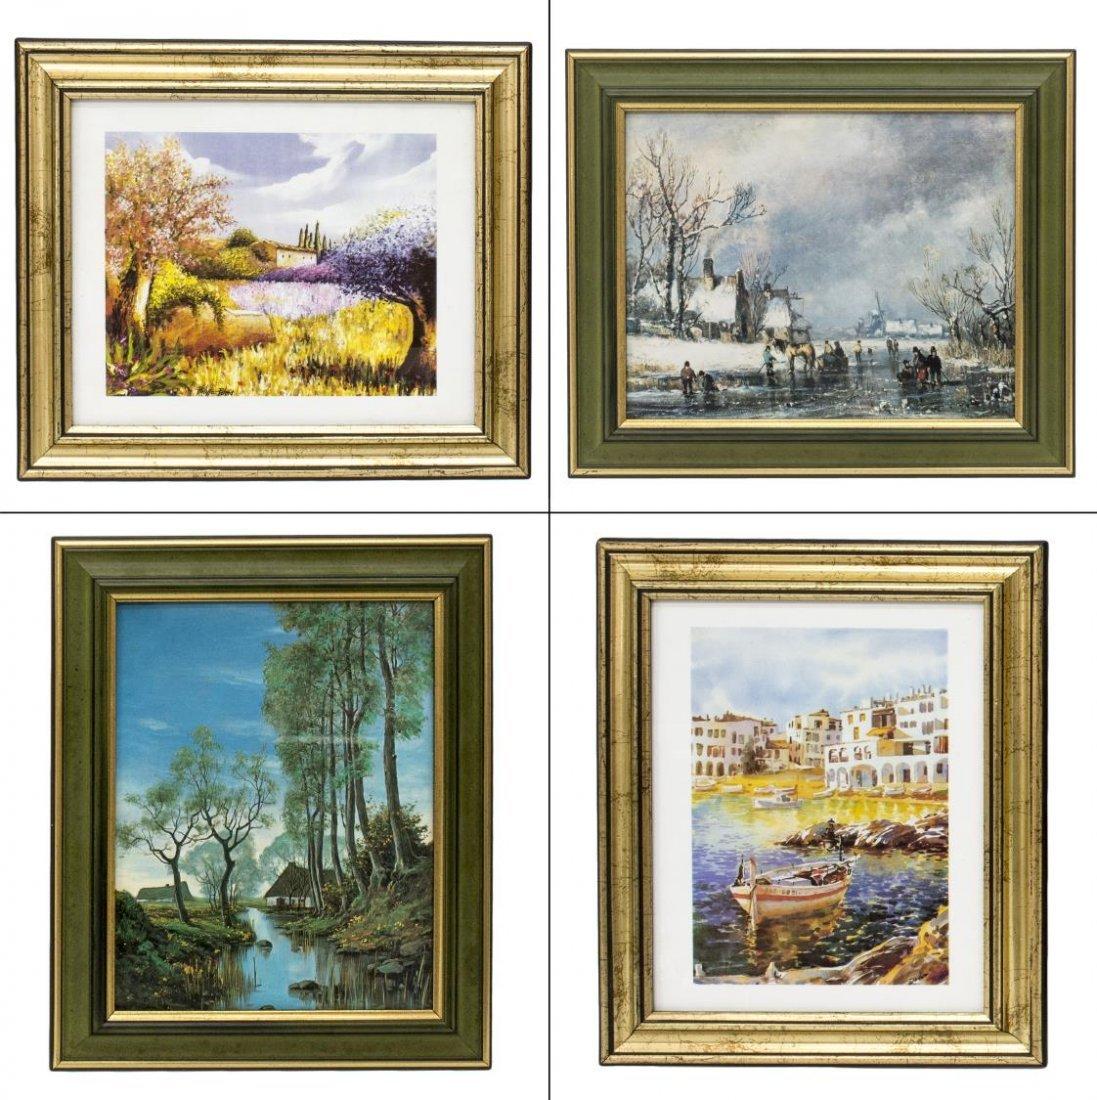 (8) GROUP OF FRAMED ARTWORKS, PRINTS, WATERCOLORS